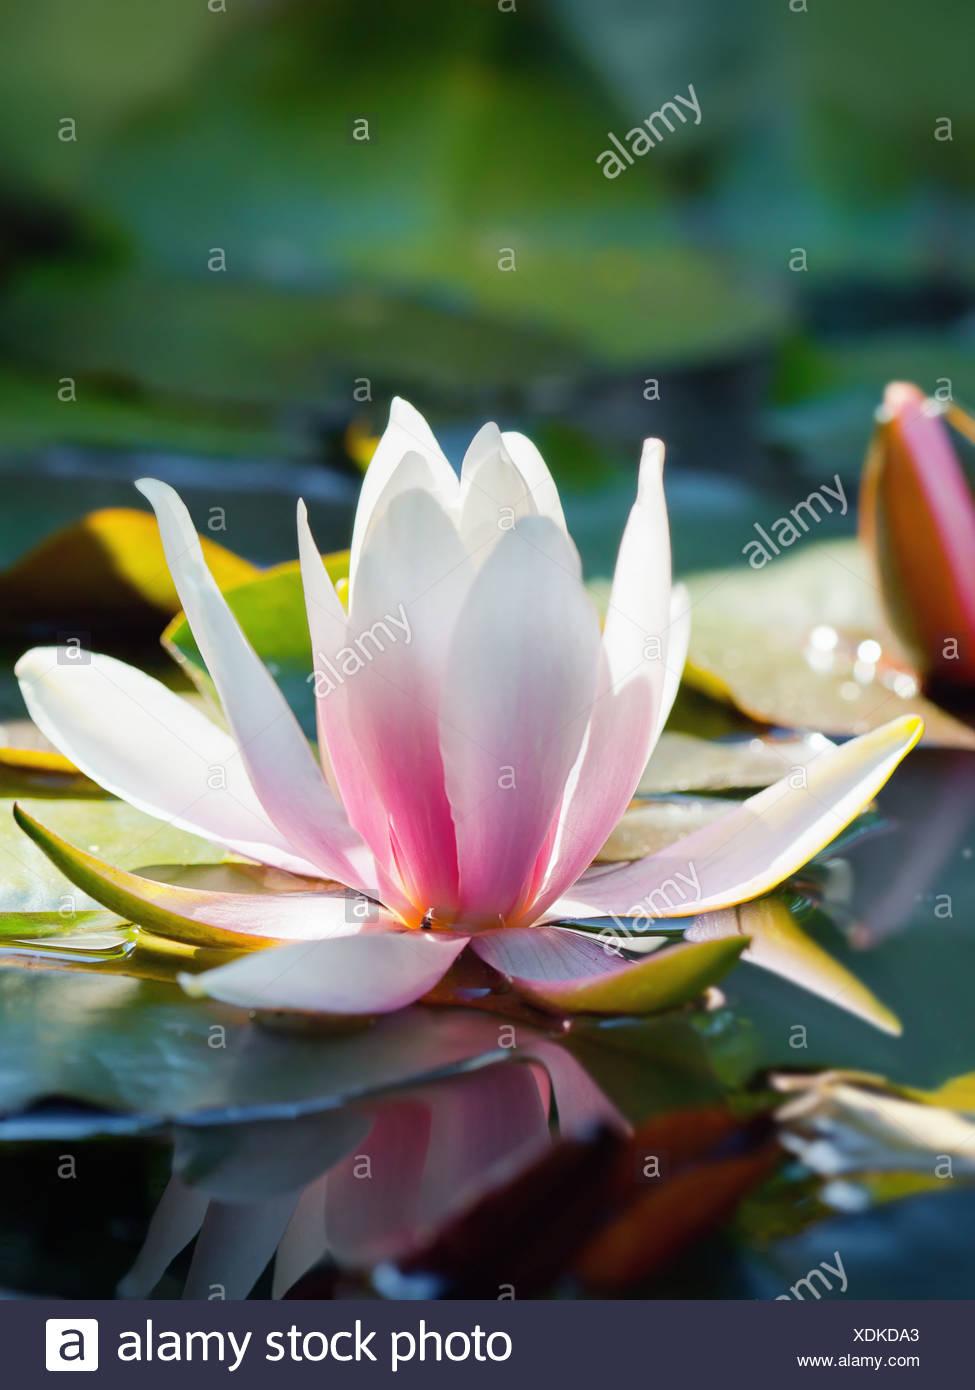 Beautiful lotus flower stock photos beautiful lotus flower stock beautiful lotus flower and background stock image izmirmasajfo Images